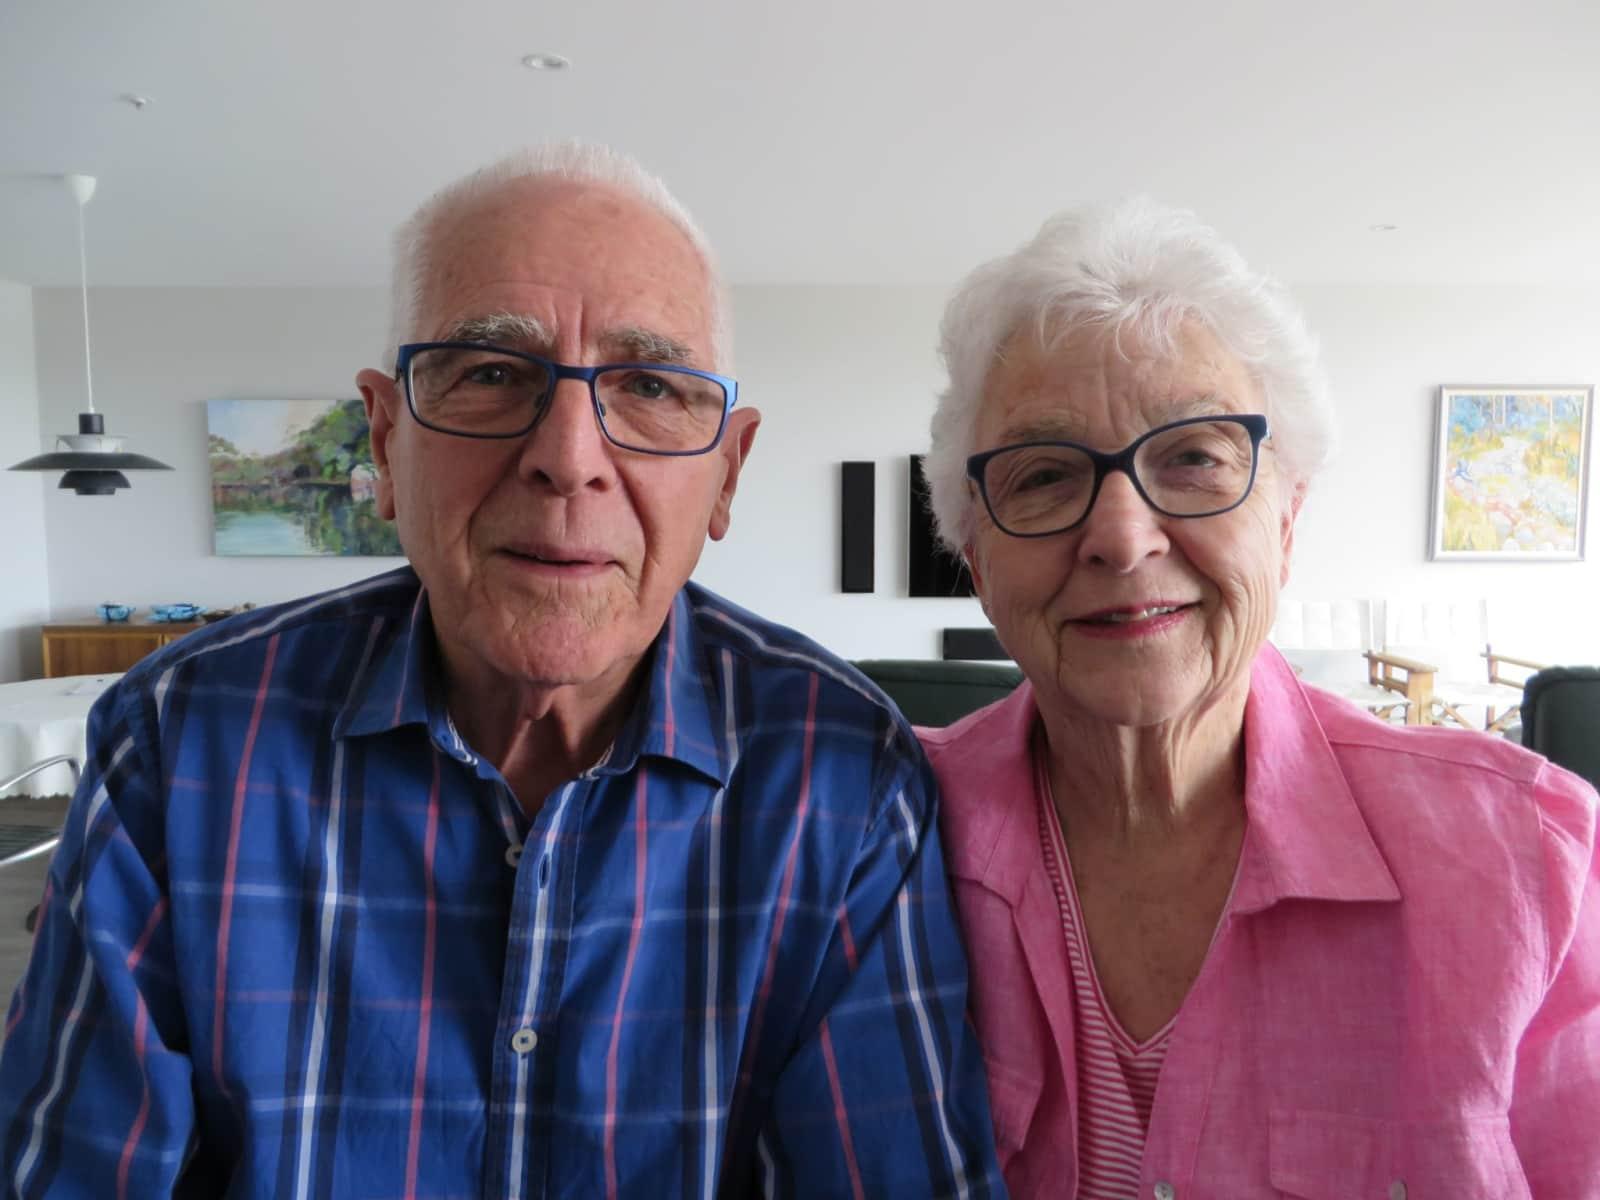 Peter & Pam from Hobart, Tasmania, Australia